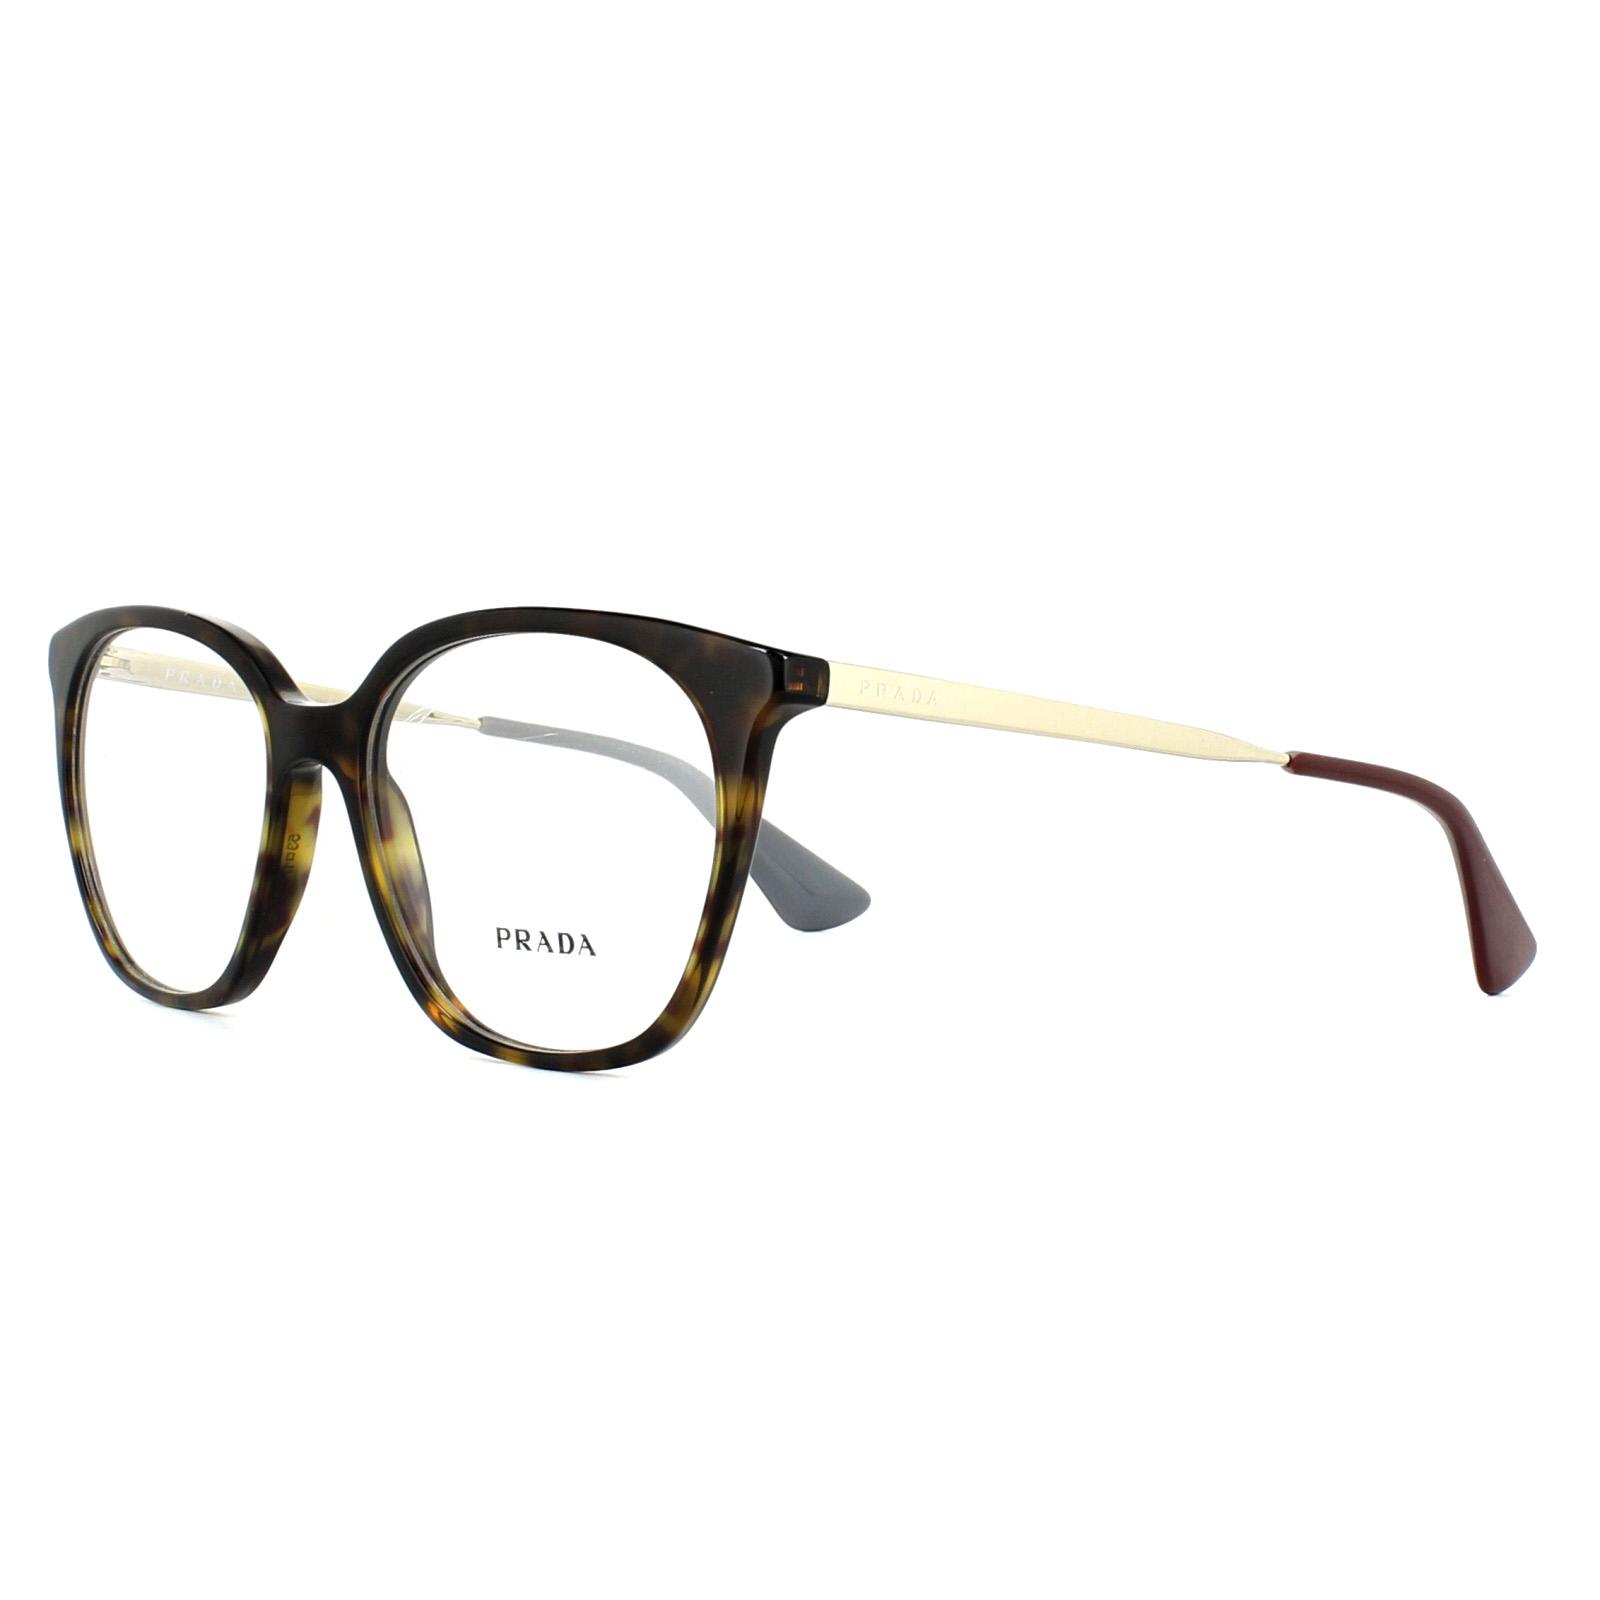 ffffe767db Prada Glasses Frames PR11TV 2AU1O1 Havana 53mm Womens 8053672673821 ...